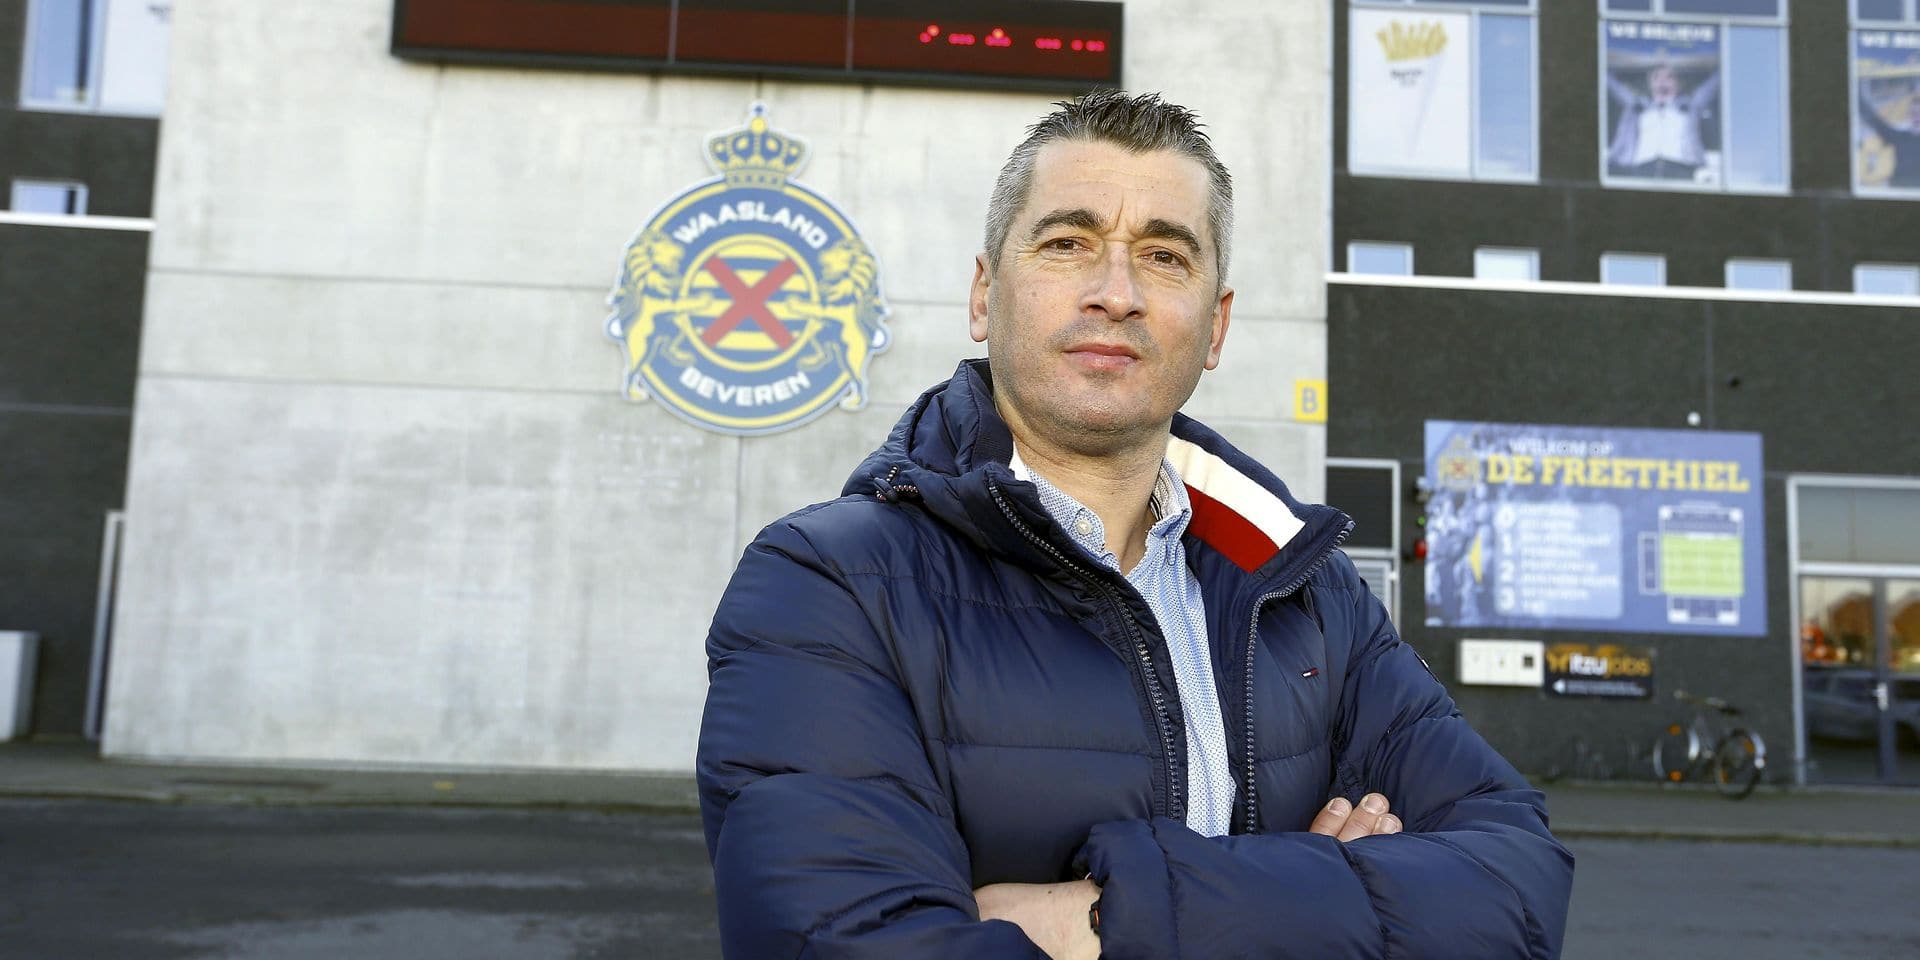 Waasland-Beveren new head coach Adnan Custovic poses at Jupiler Pro League soccer team Waasland-Beveren, Saturday 17 November 2018 in Beveren-Waas. BELGA PHOTO NICOLAS MAETERLINCK